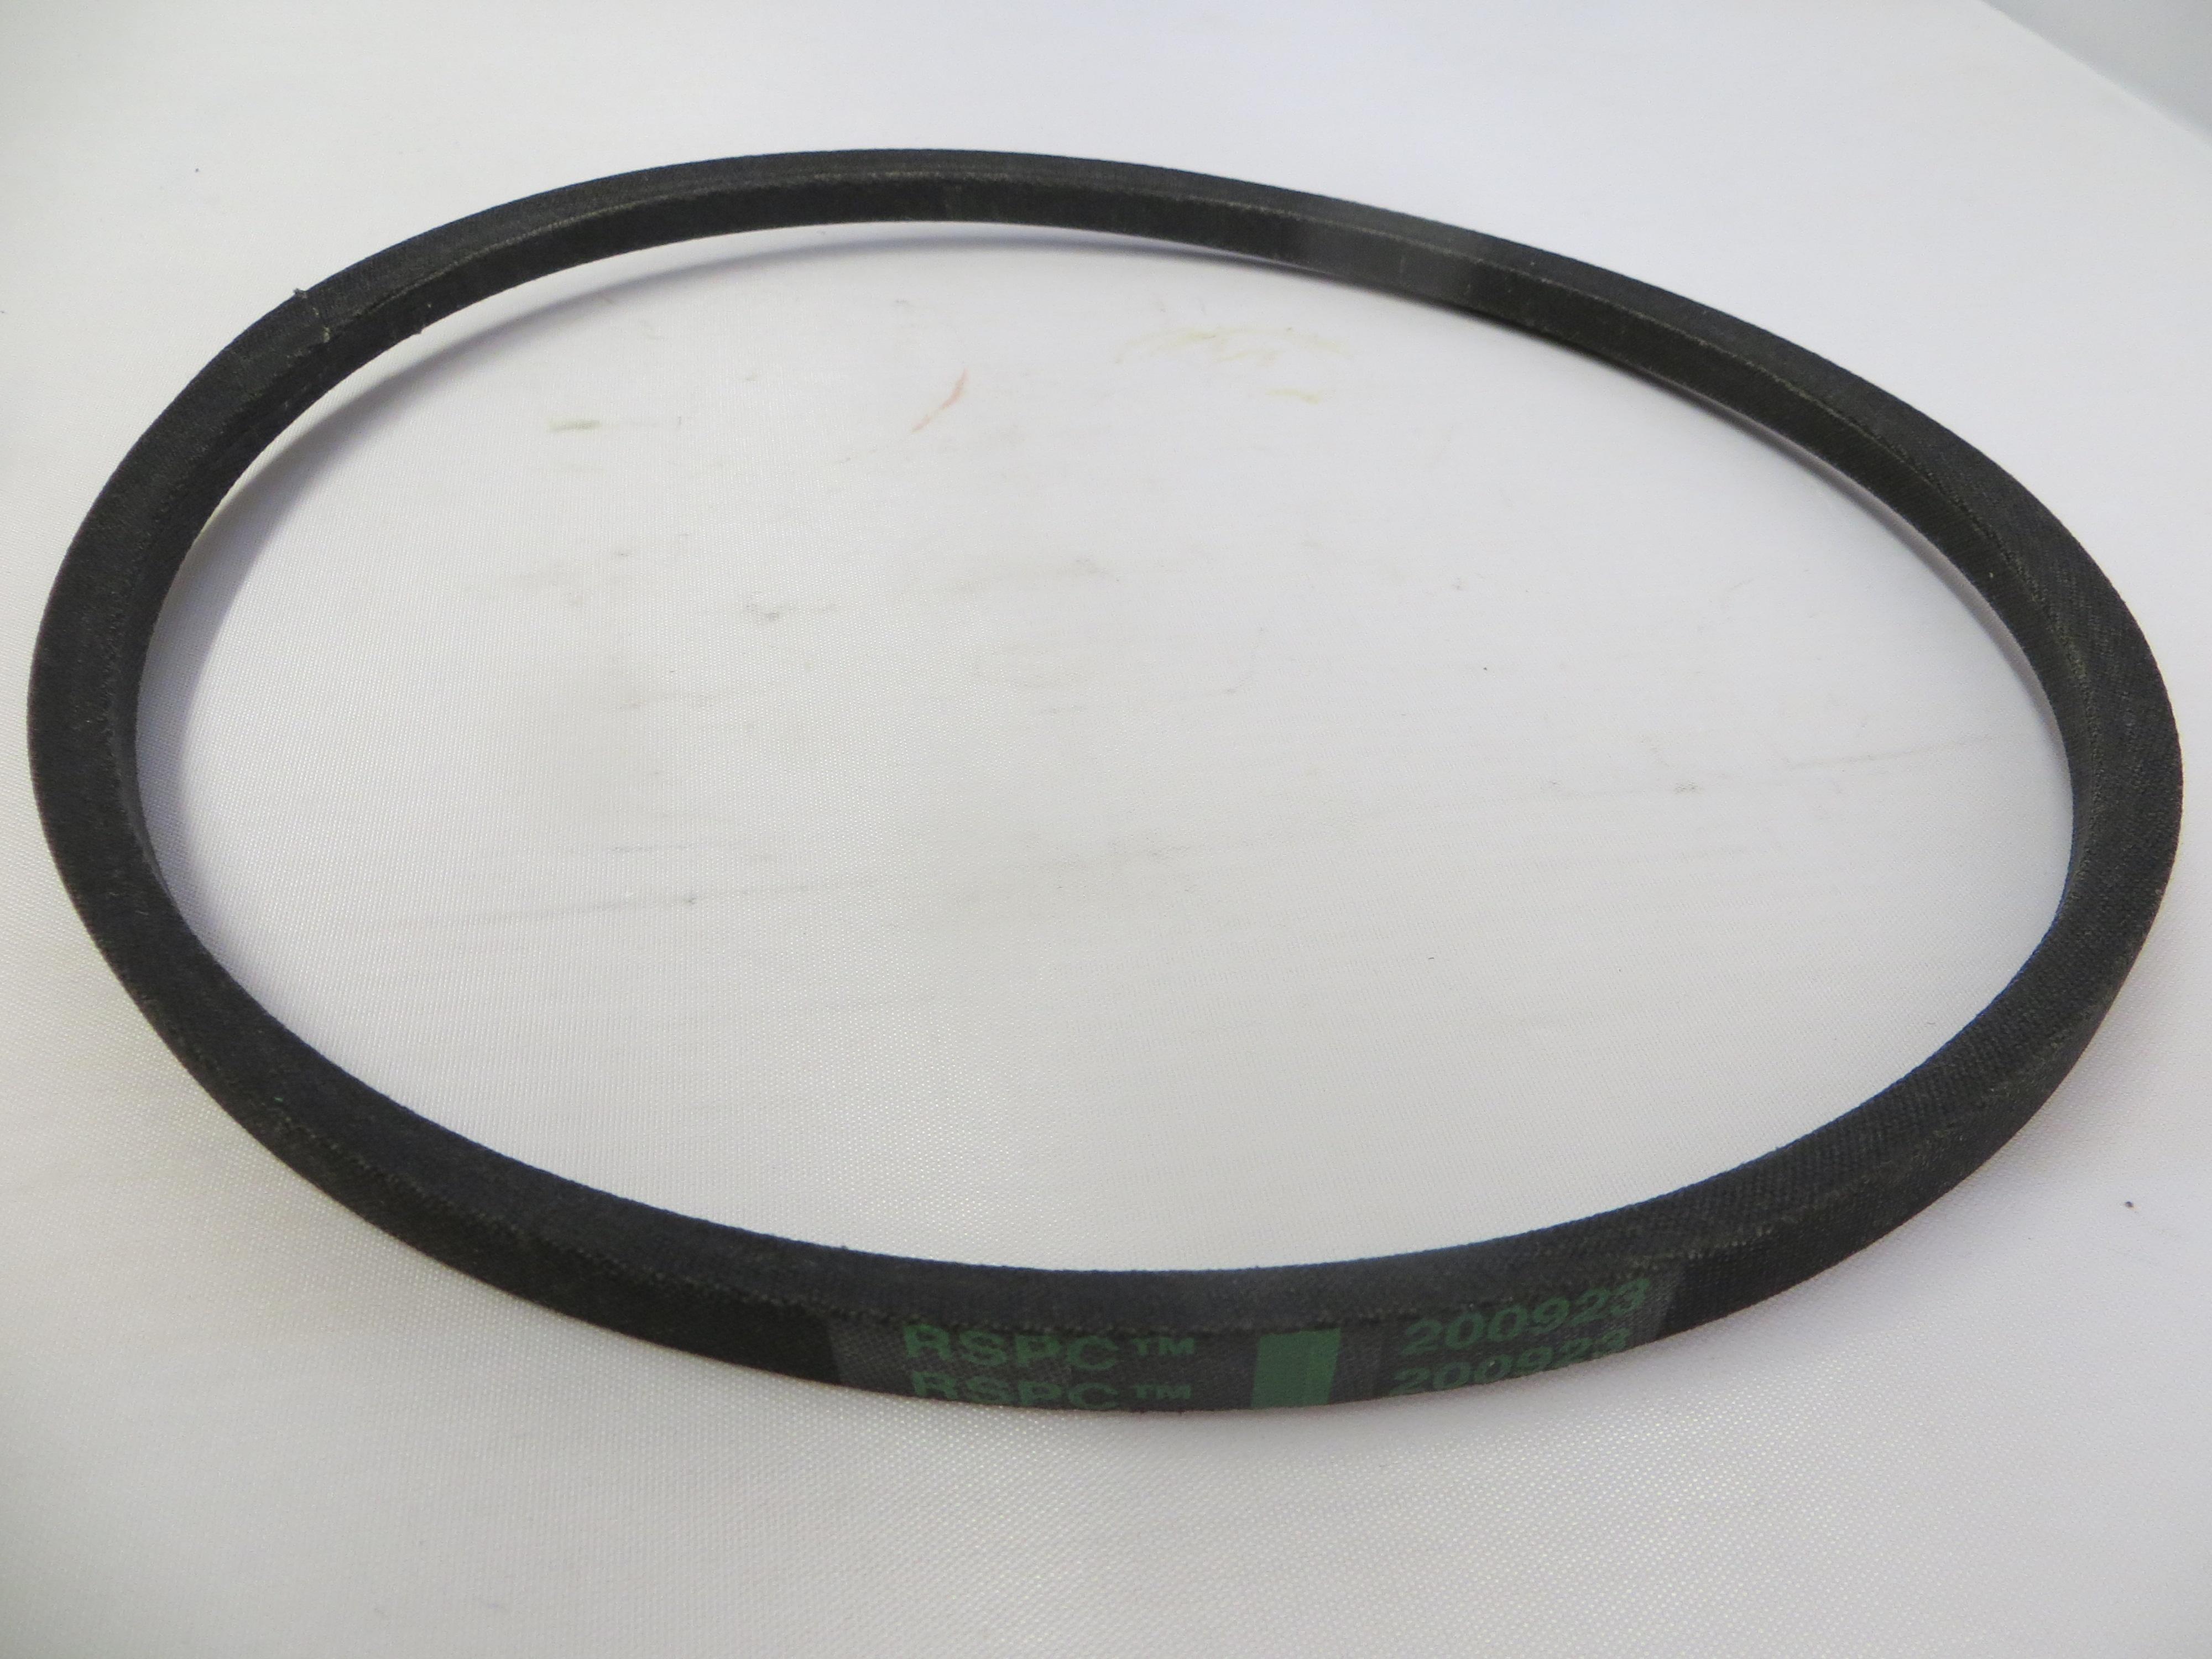 Spin & Agitate Belt - Green Label